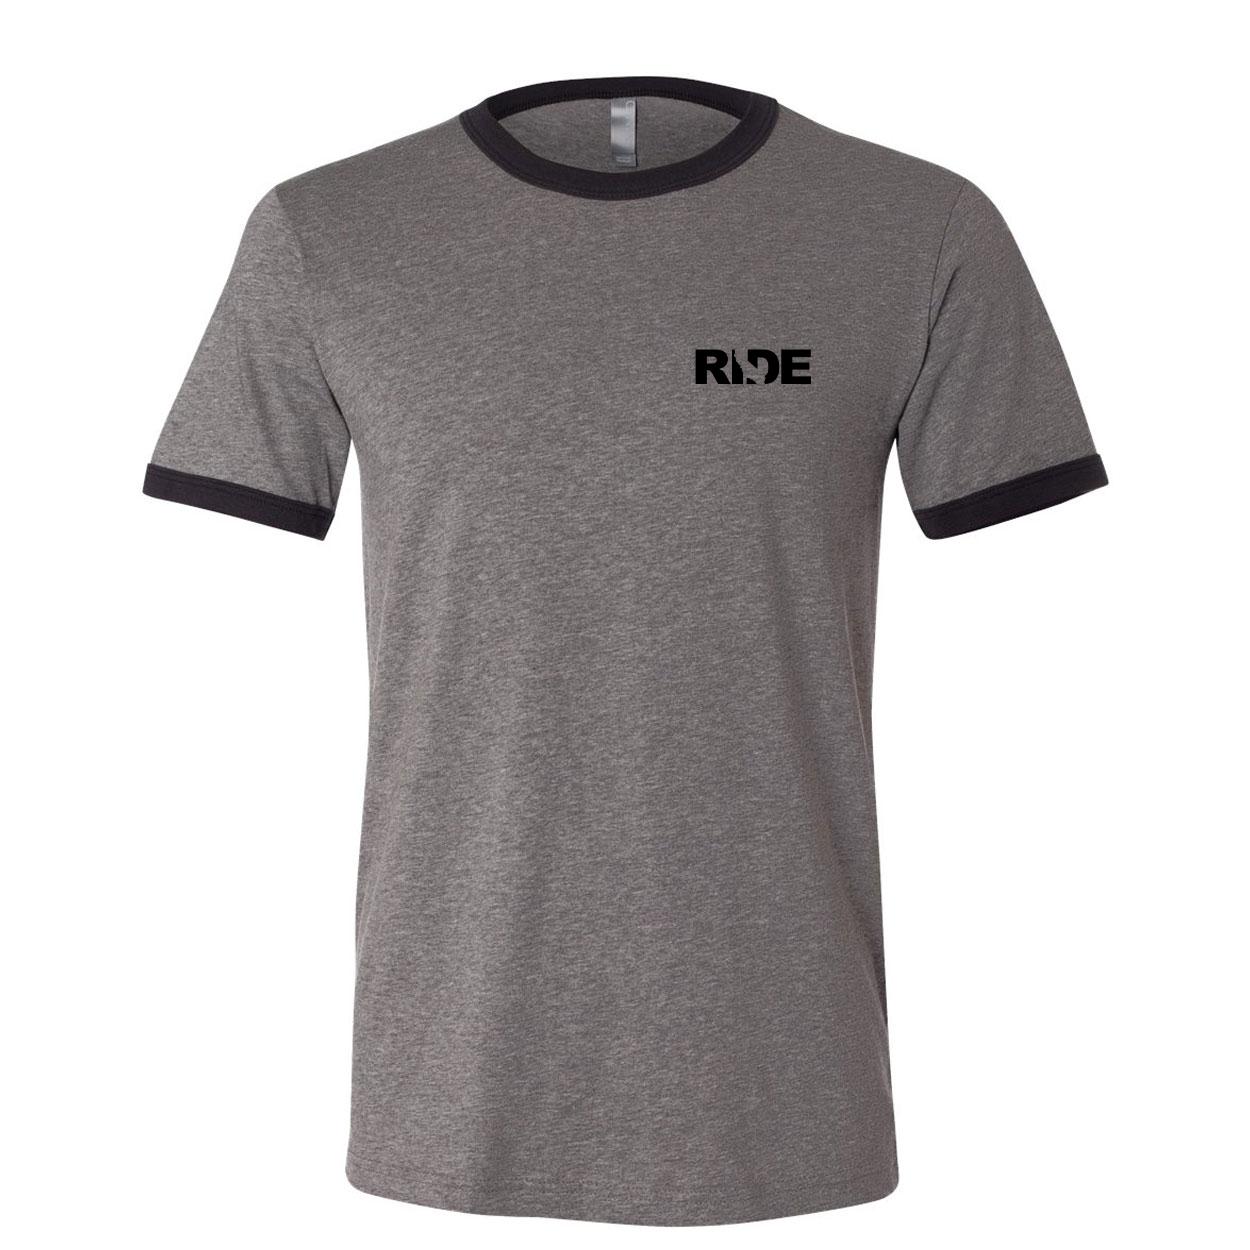 Ride California Night Out Unisex Premium Ringer T-Shirt Deep Heather Gray/Black Trim (Black Logo)